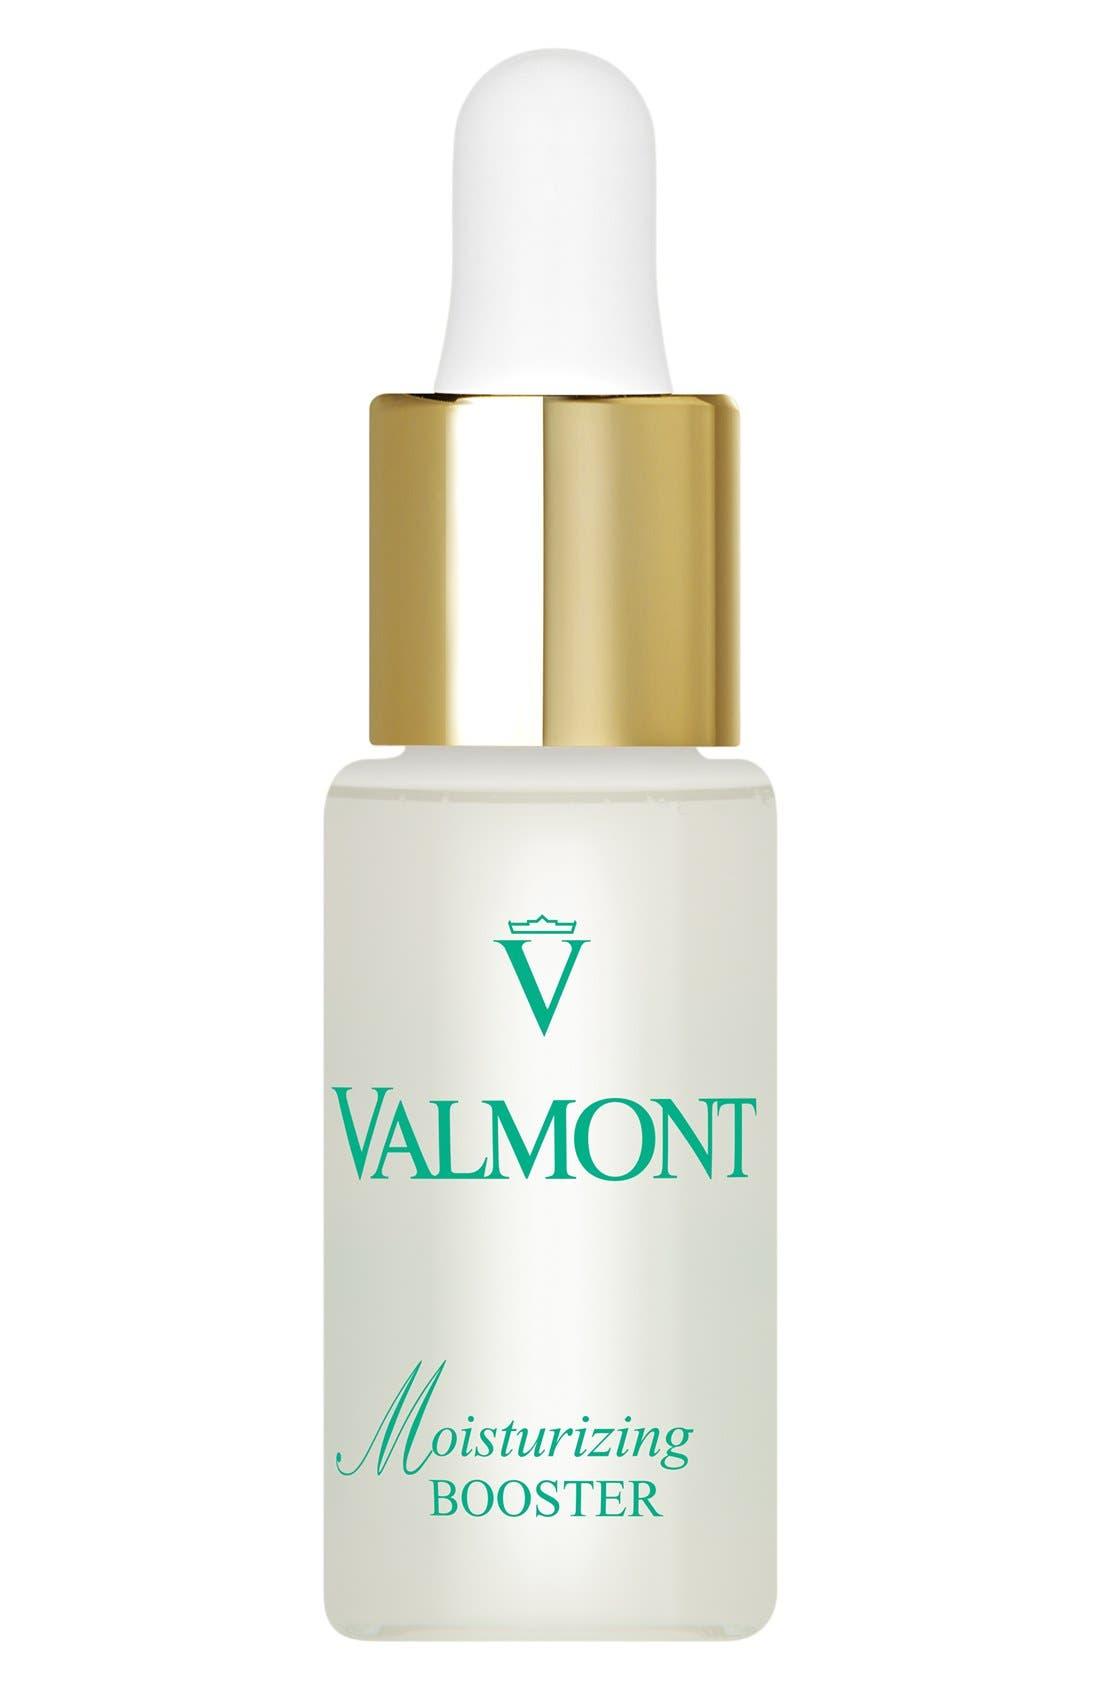 Valmont Moisturizing Booster